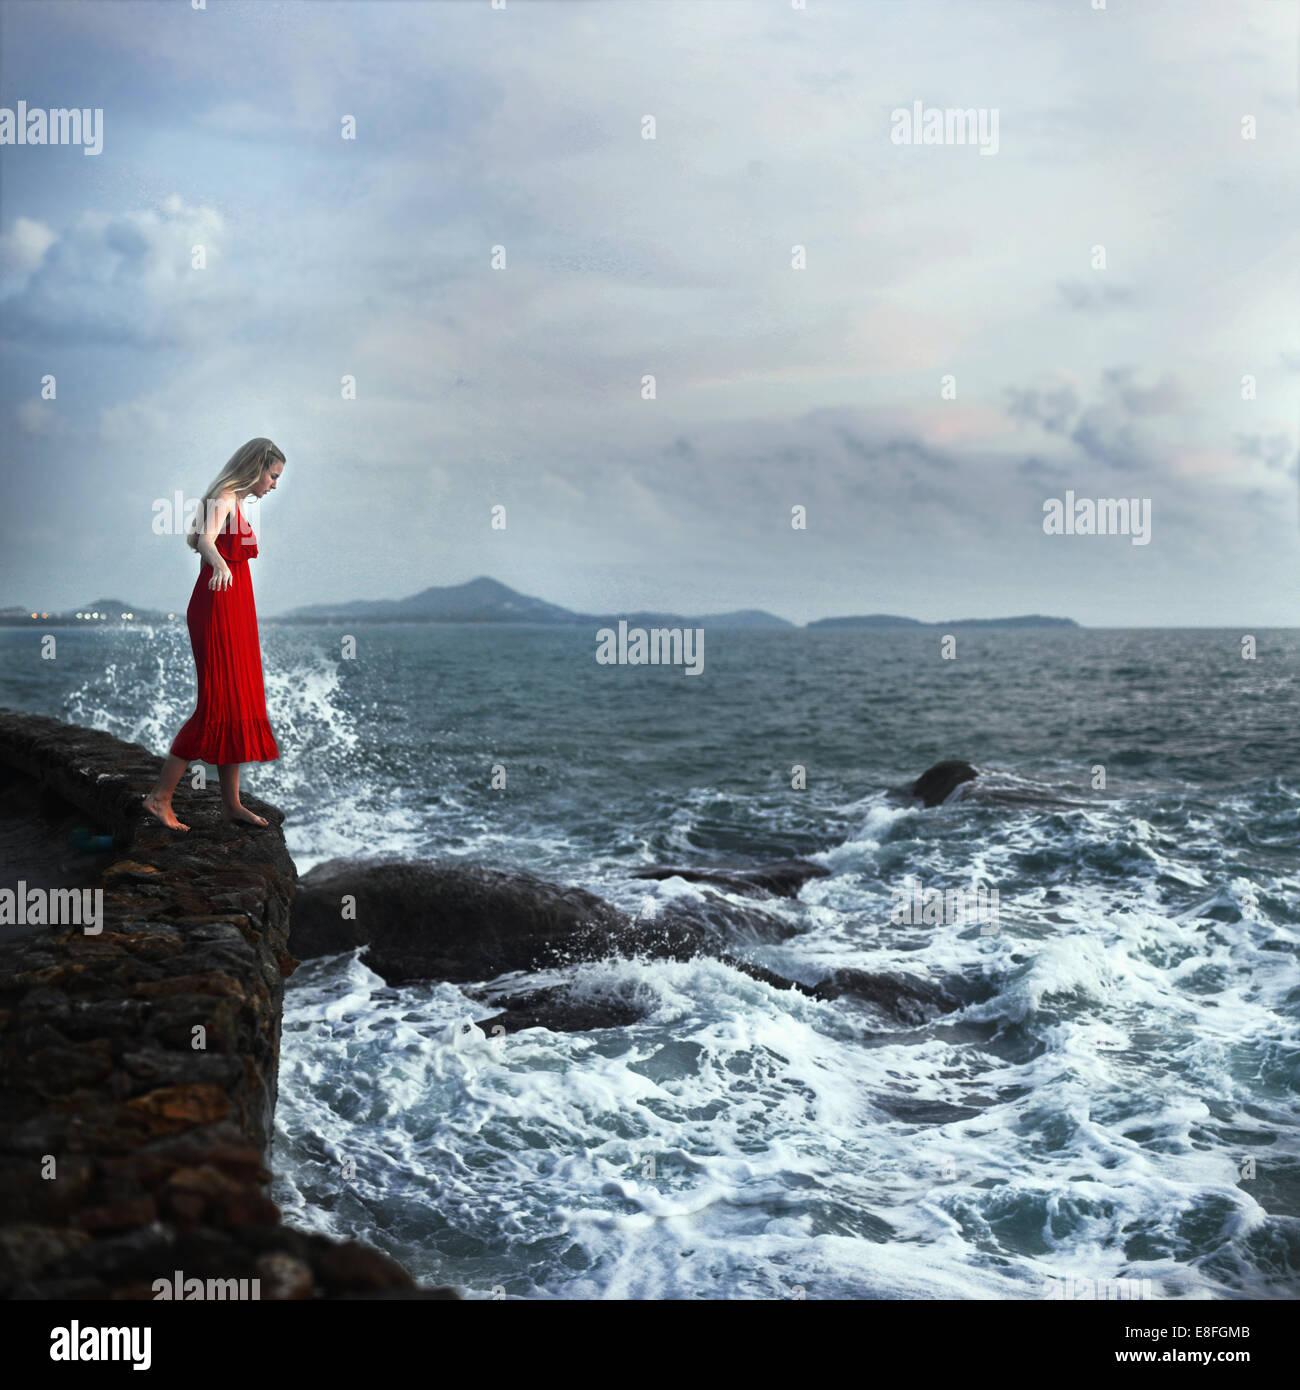 Woman standing on edge of cliffs, Koh Samui, Thailand - Stock Image